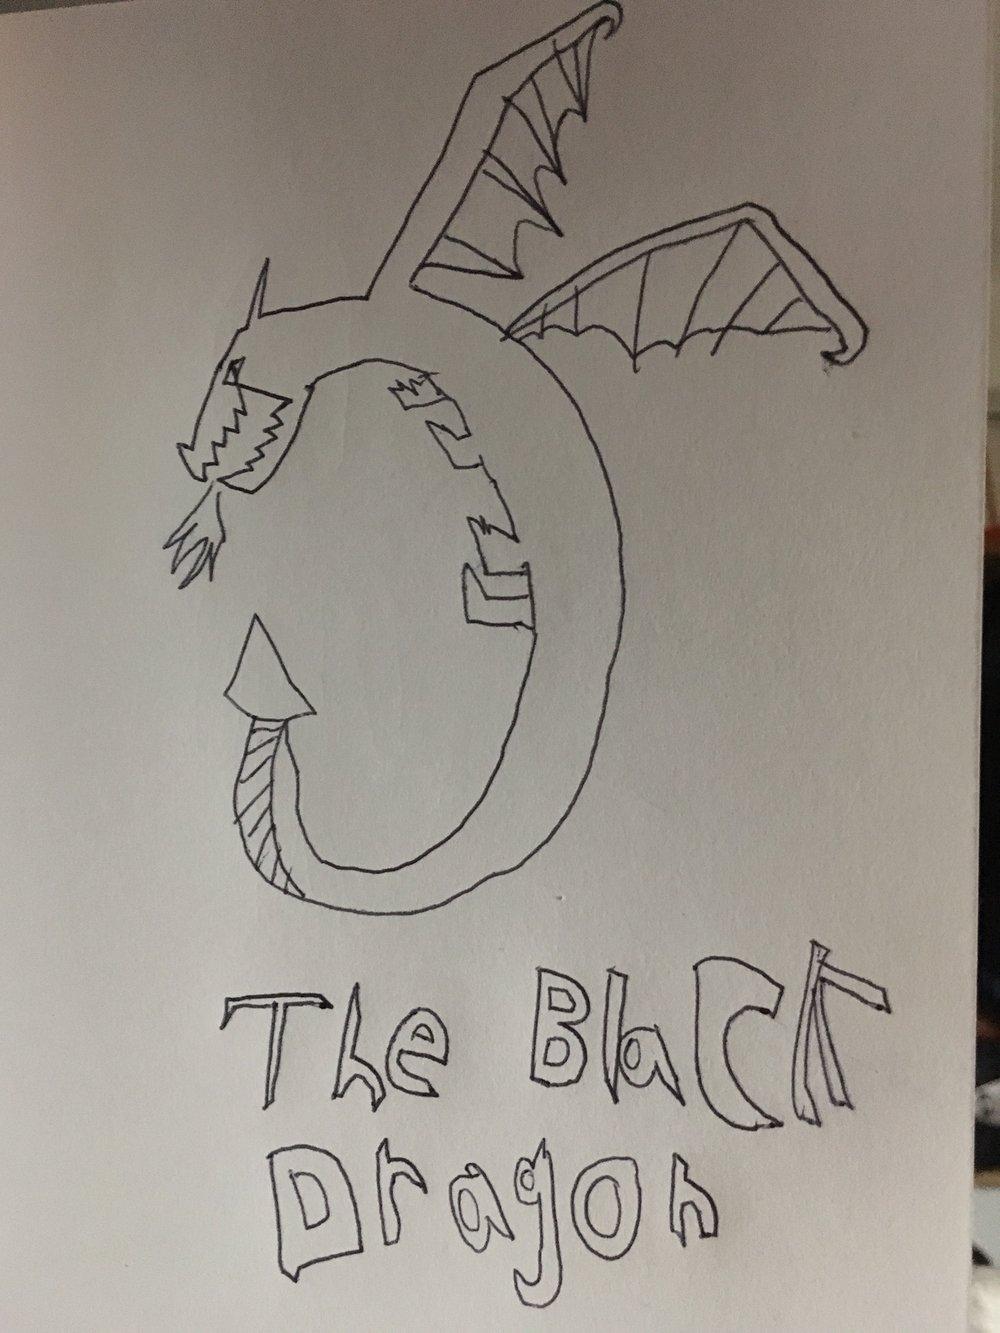 Black Dragon Drawing.JPG